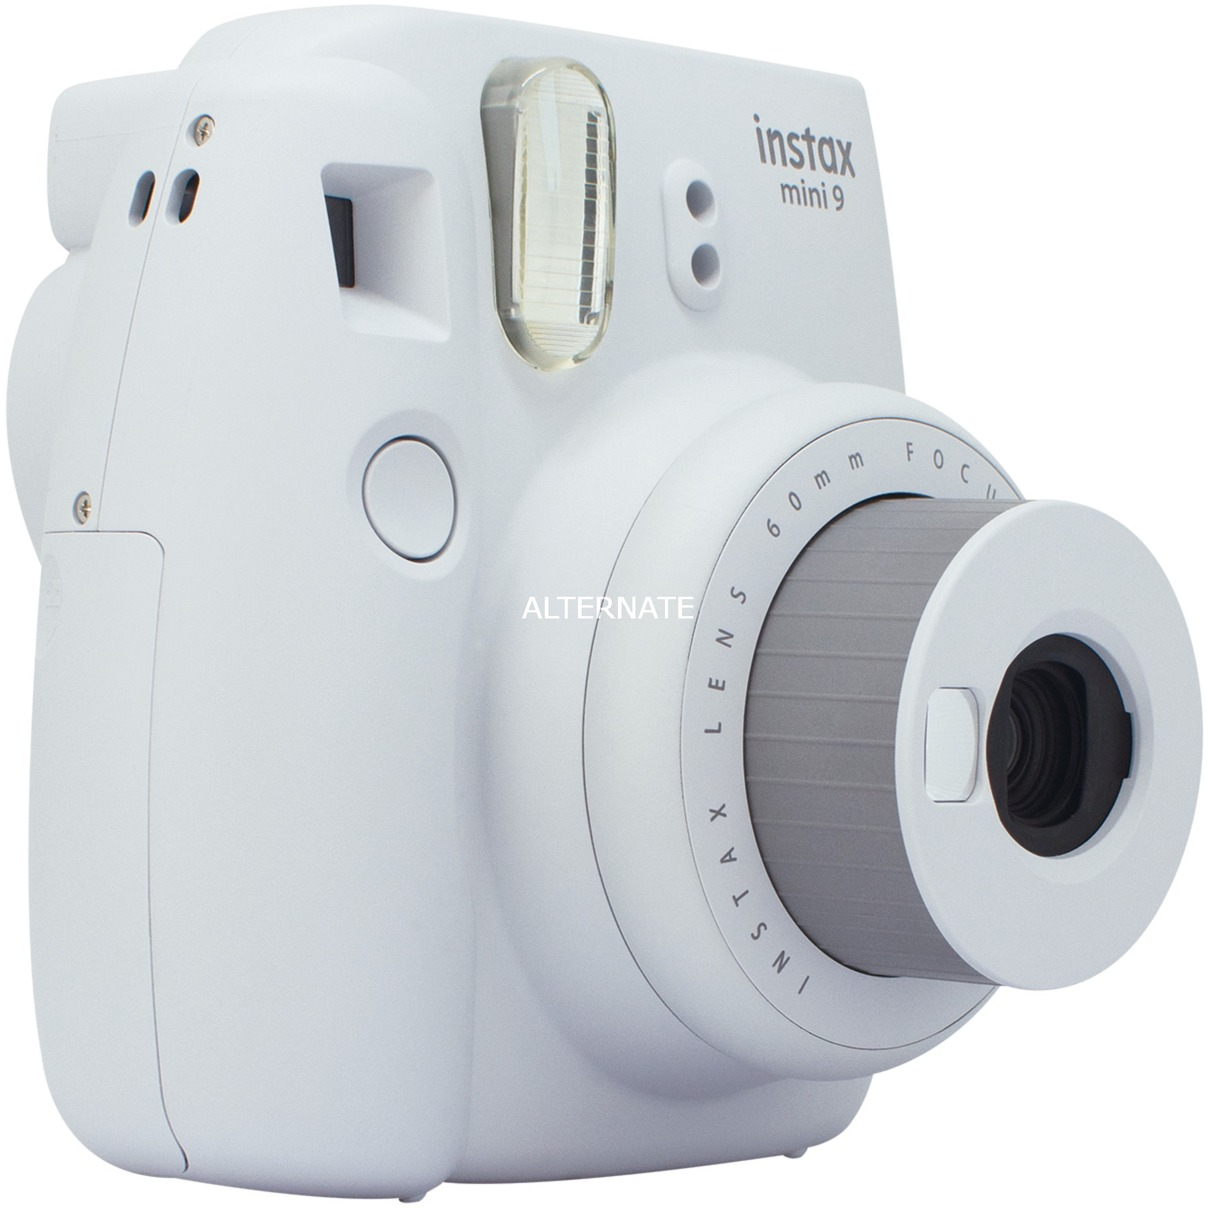 Instax Mini 9 cámara instantánea impresión 62 x 46 mm Blanco